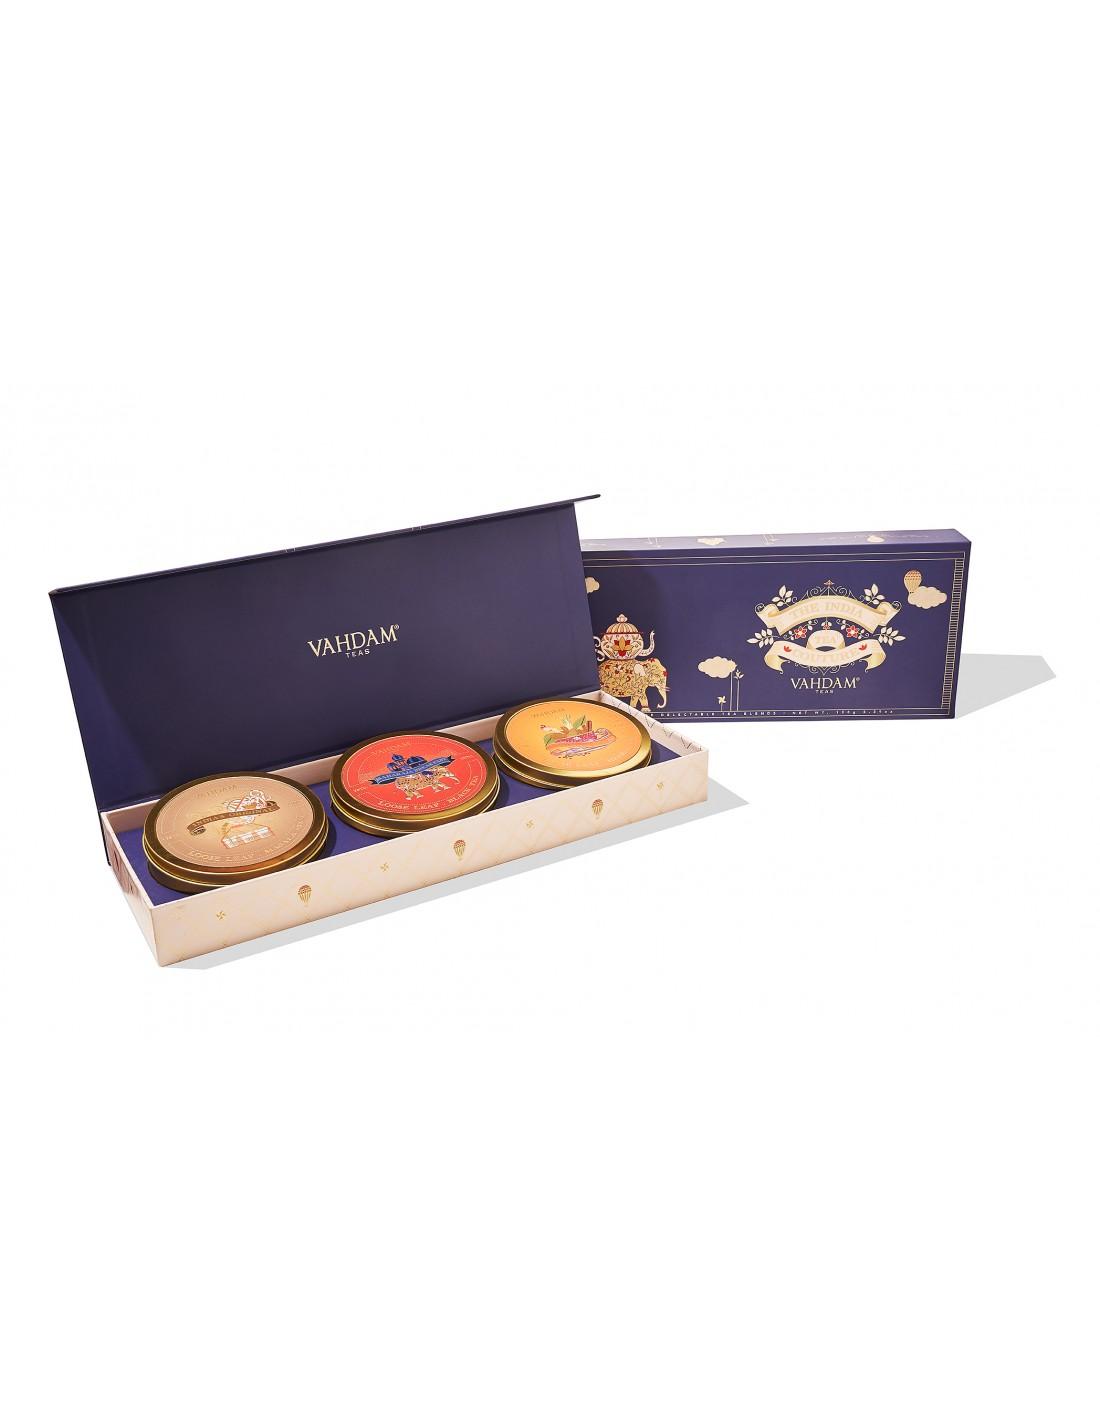 India Tea Couture - Republika Smaków Sp. z o.o.